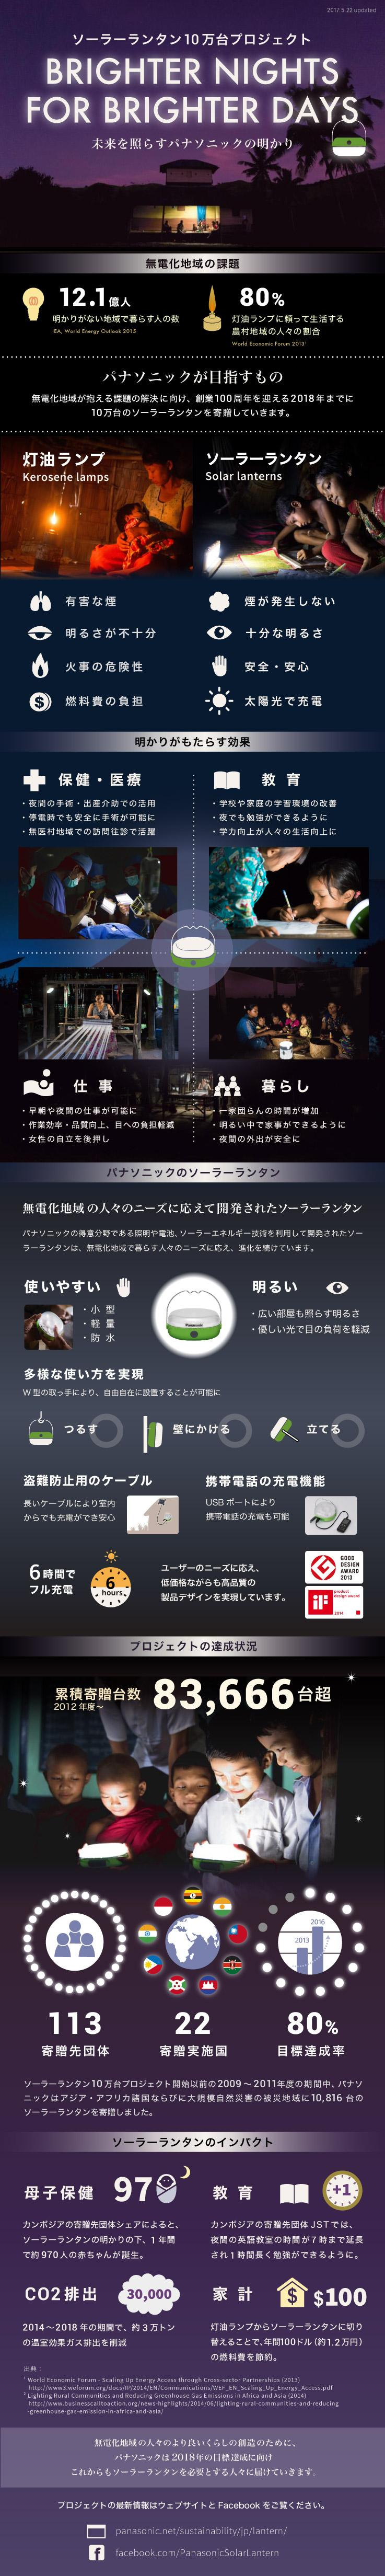 170522_Summary-JP.jpg